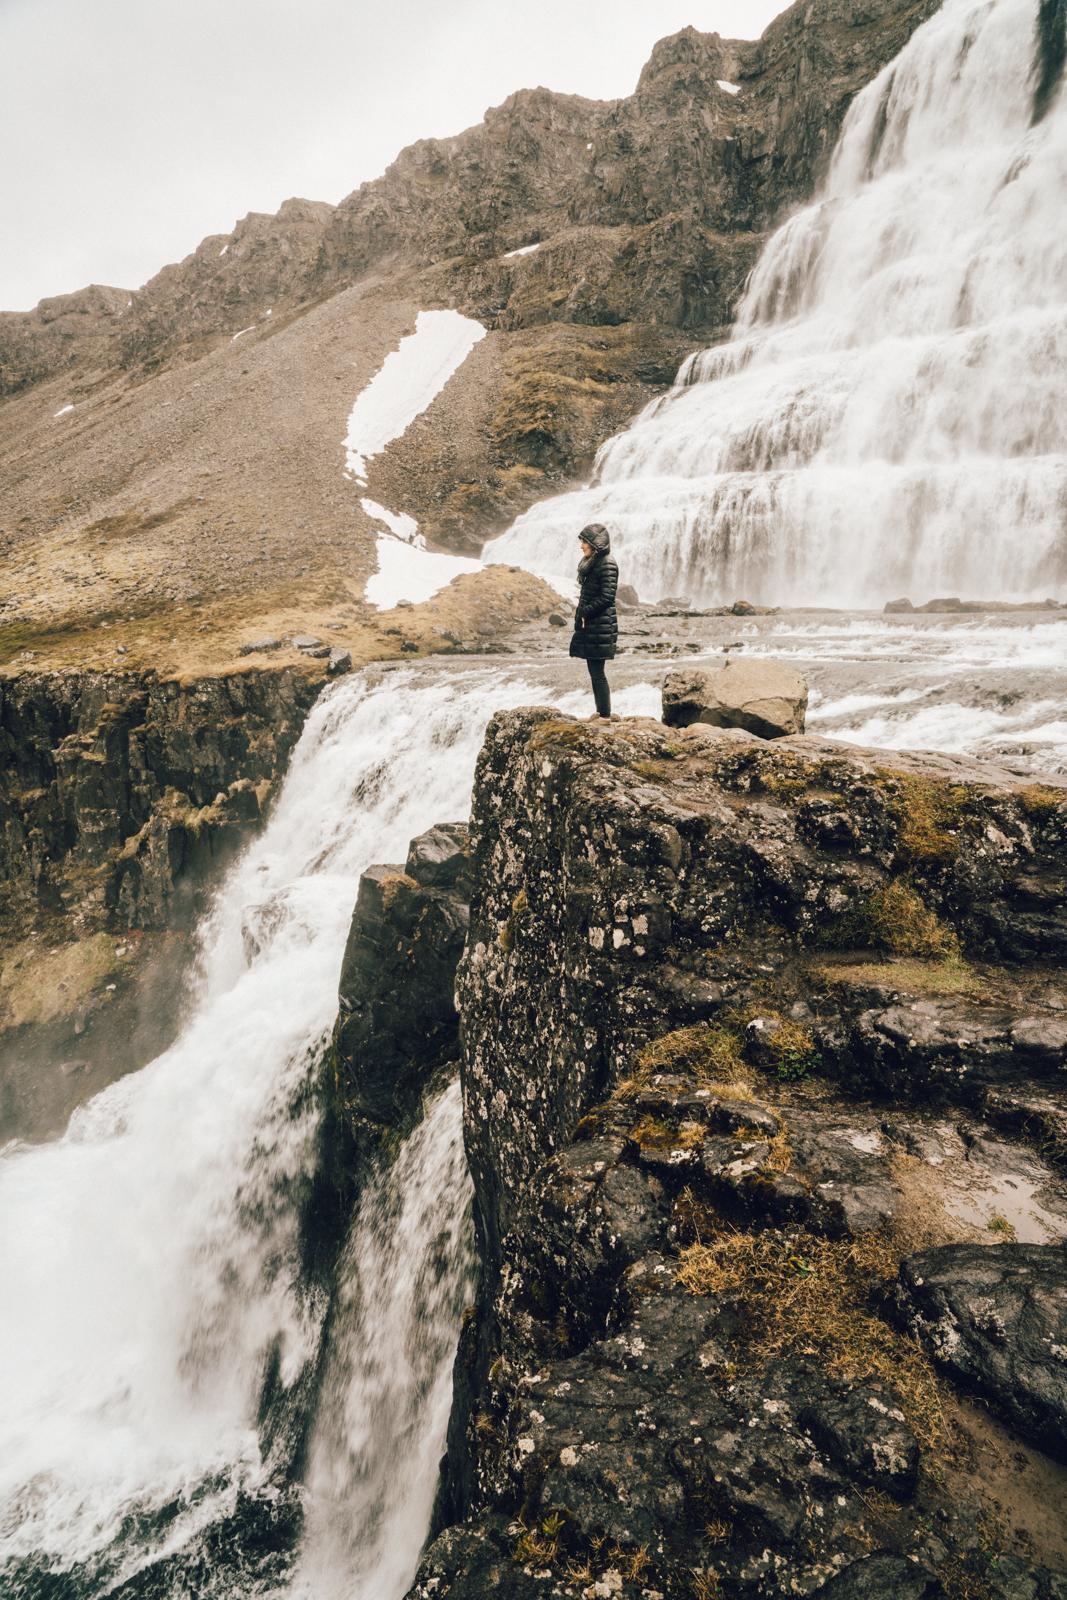 visitwestfjords-7.jpg